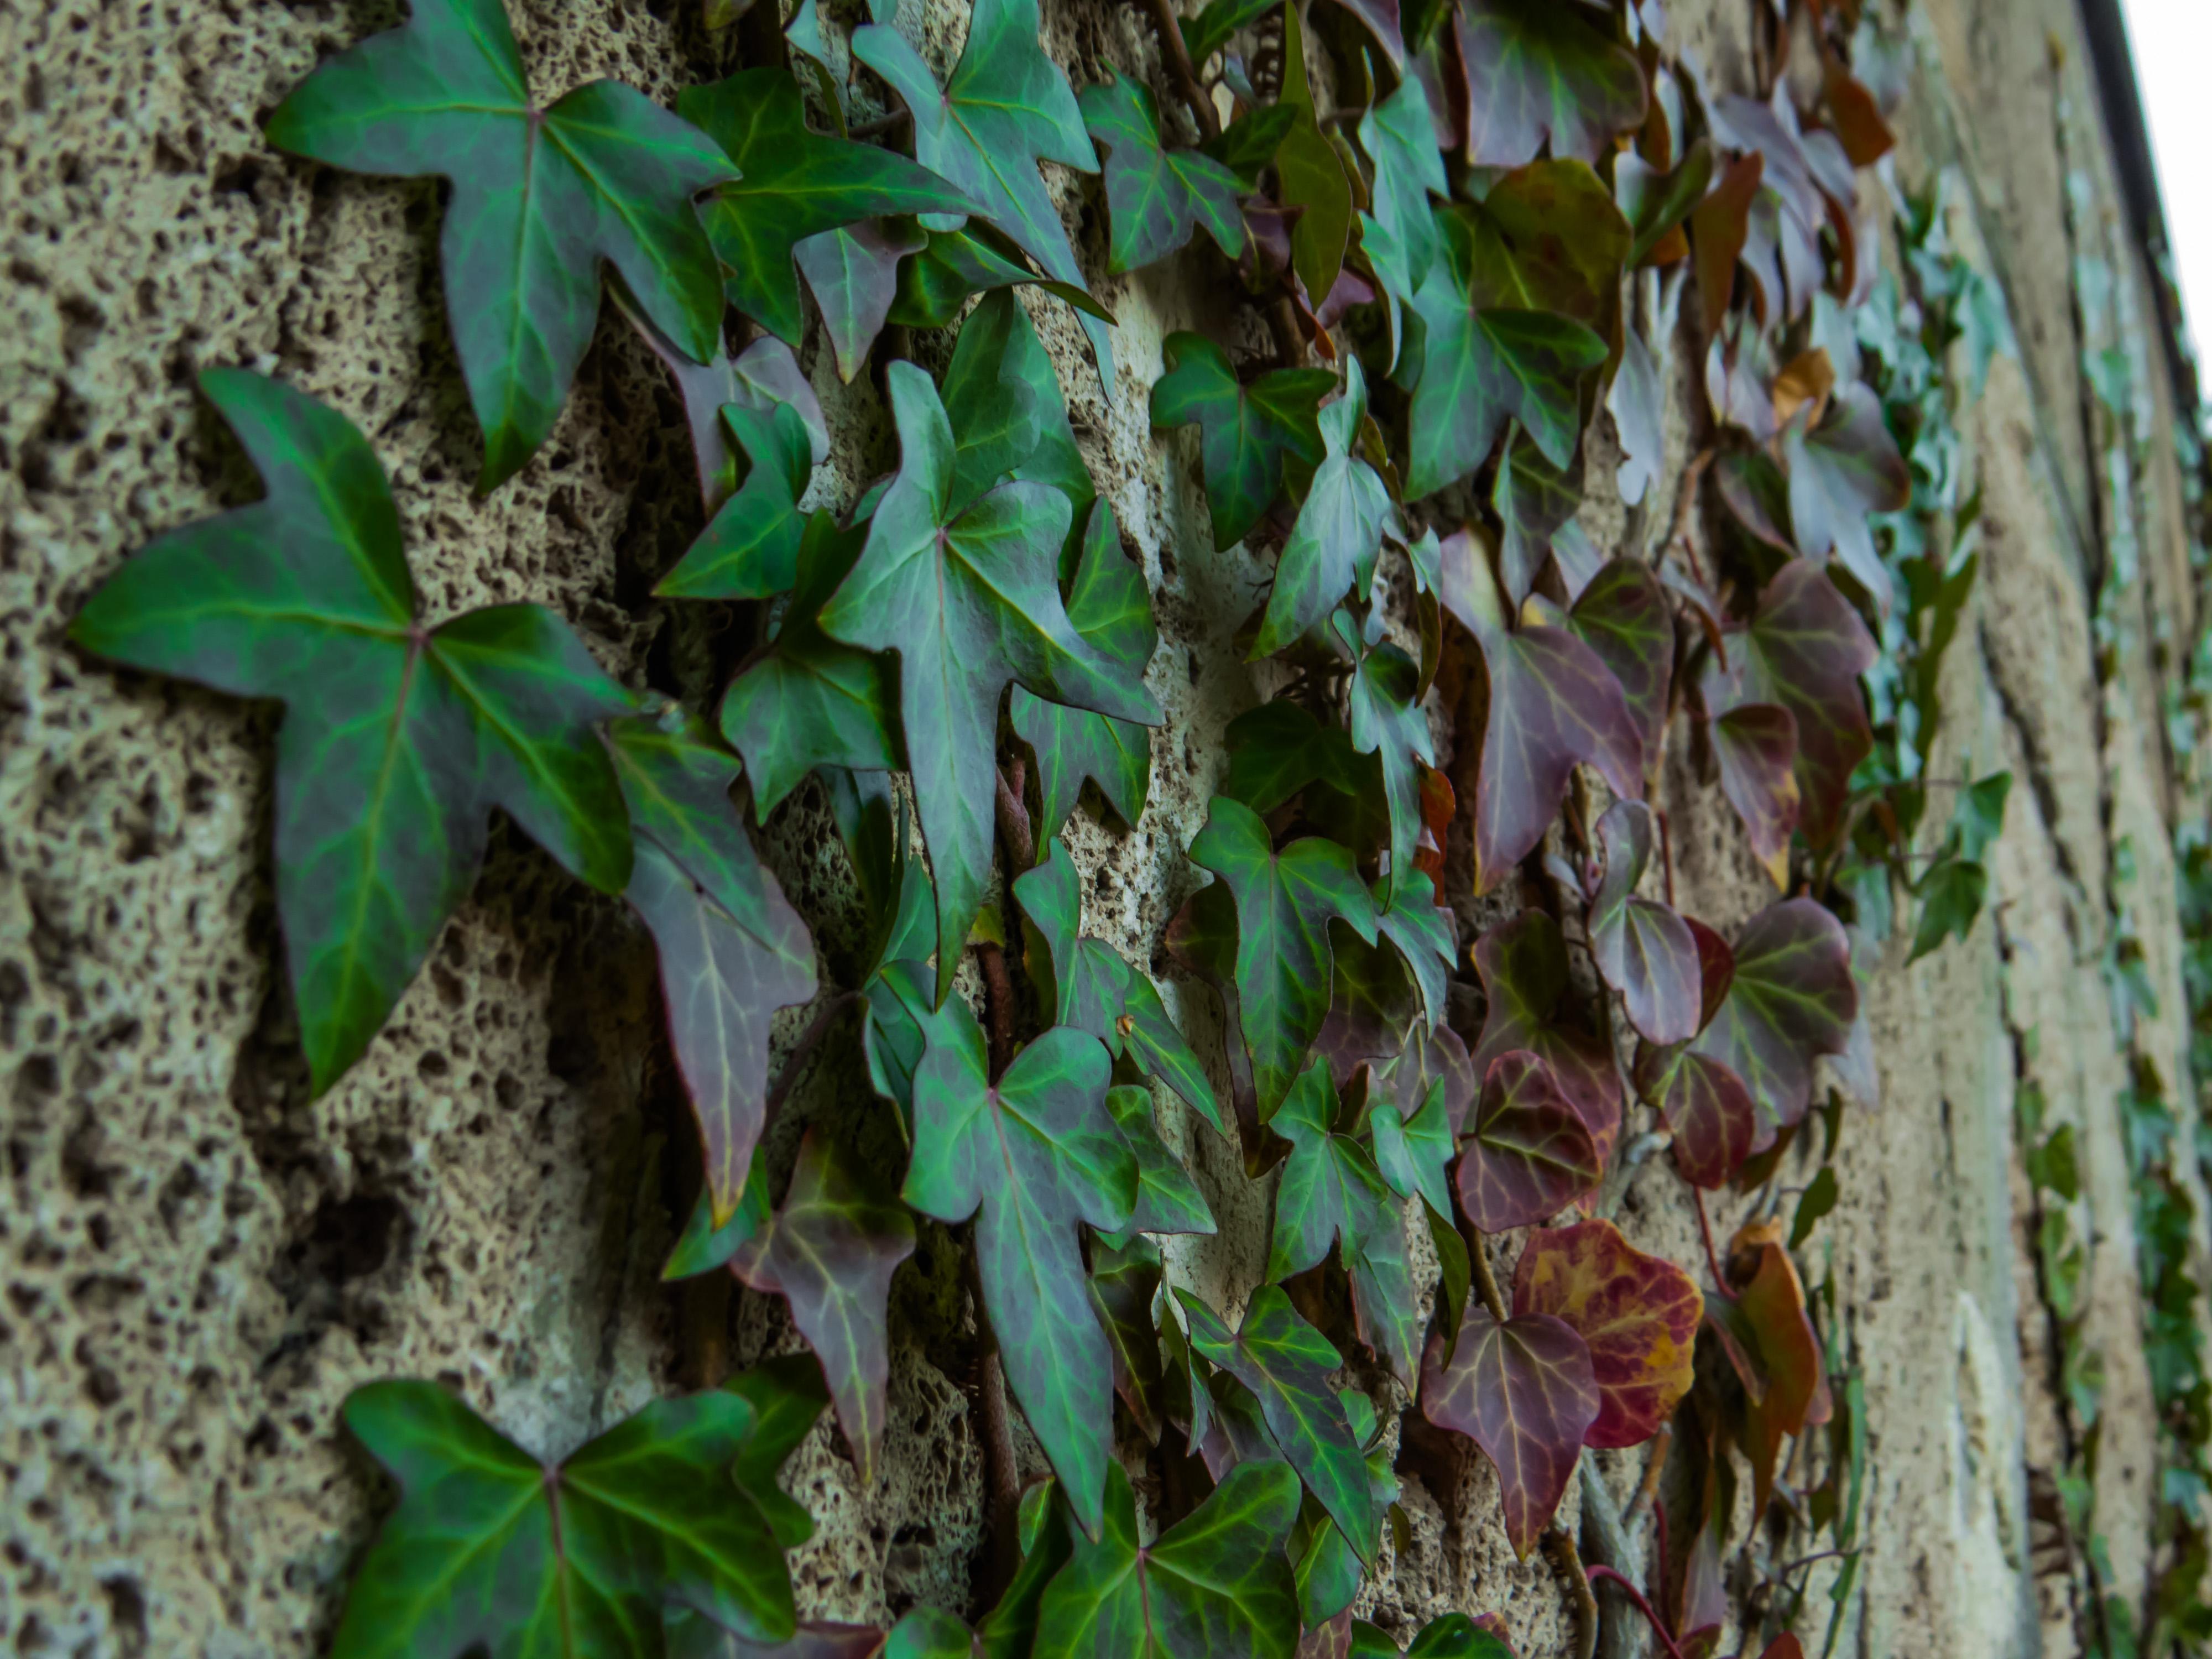 Wall plant, Beautiful, Fall, Graveyard, Green, HQ Photo